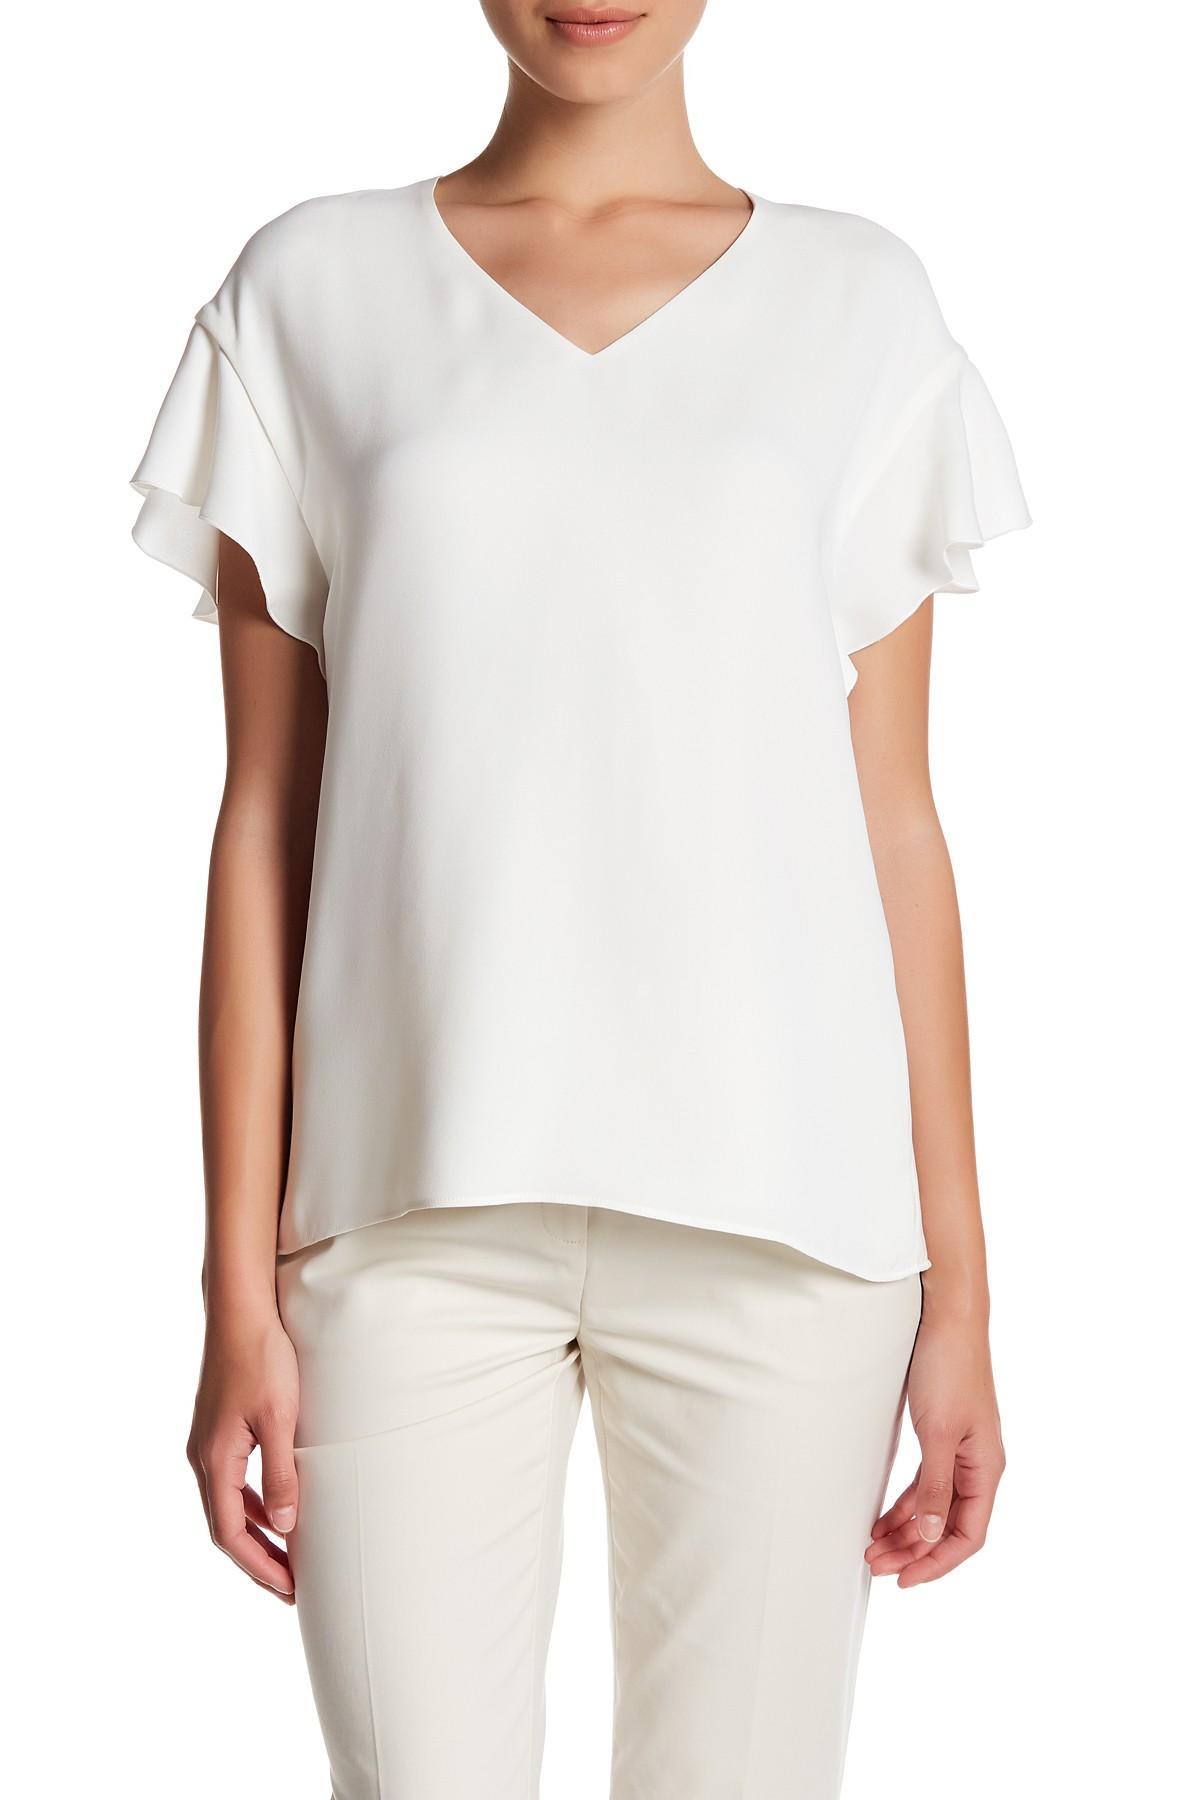 White Silk Blouse Petite | RLDM